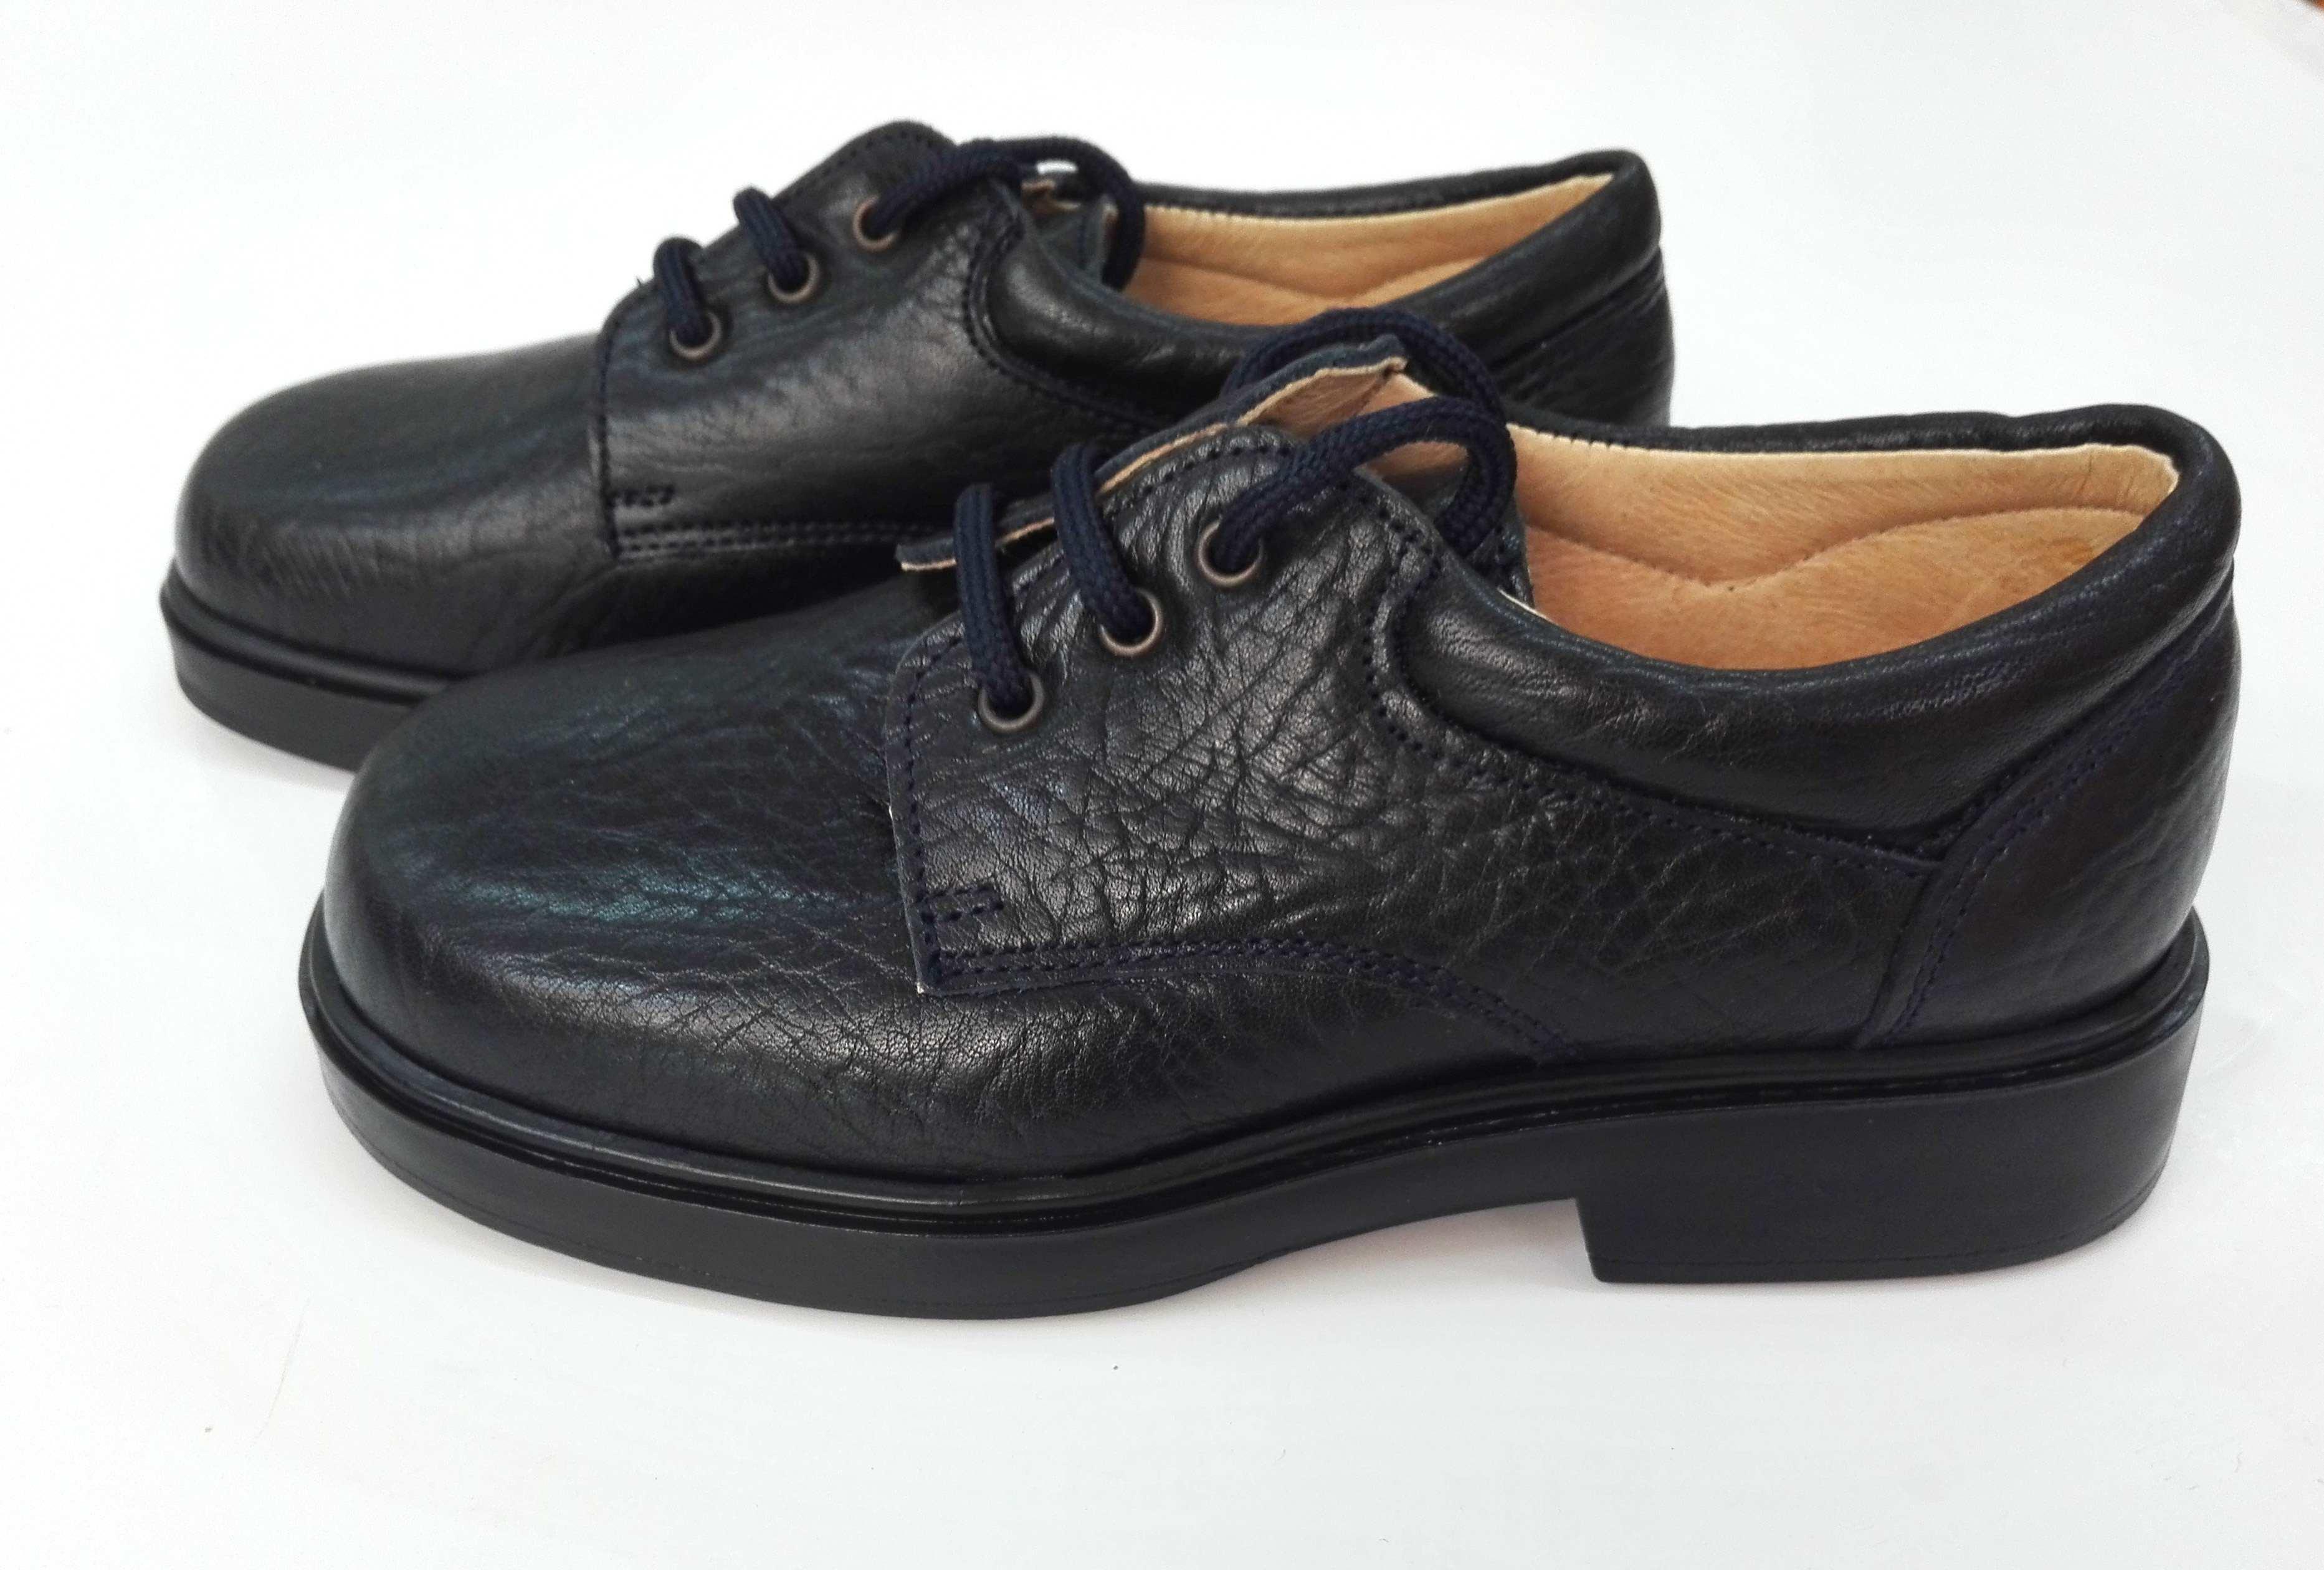 41f45bea1 Zapato cordón piel MARINO - Arca Boutique Infantil-Juvenil